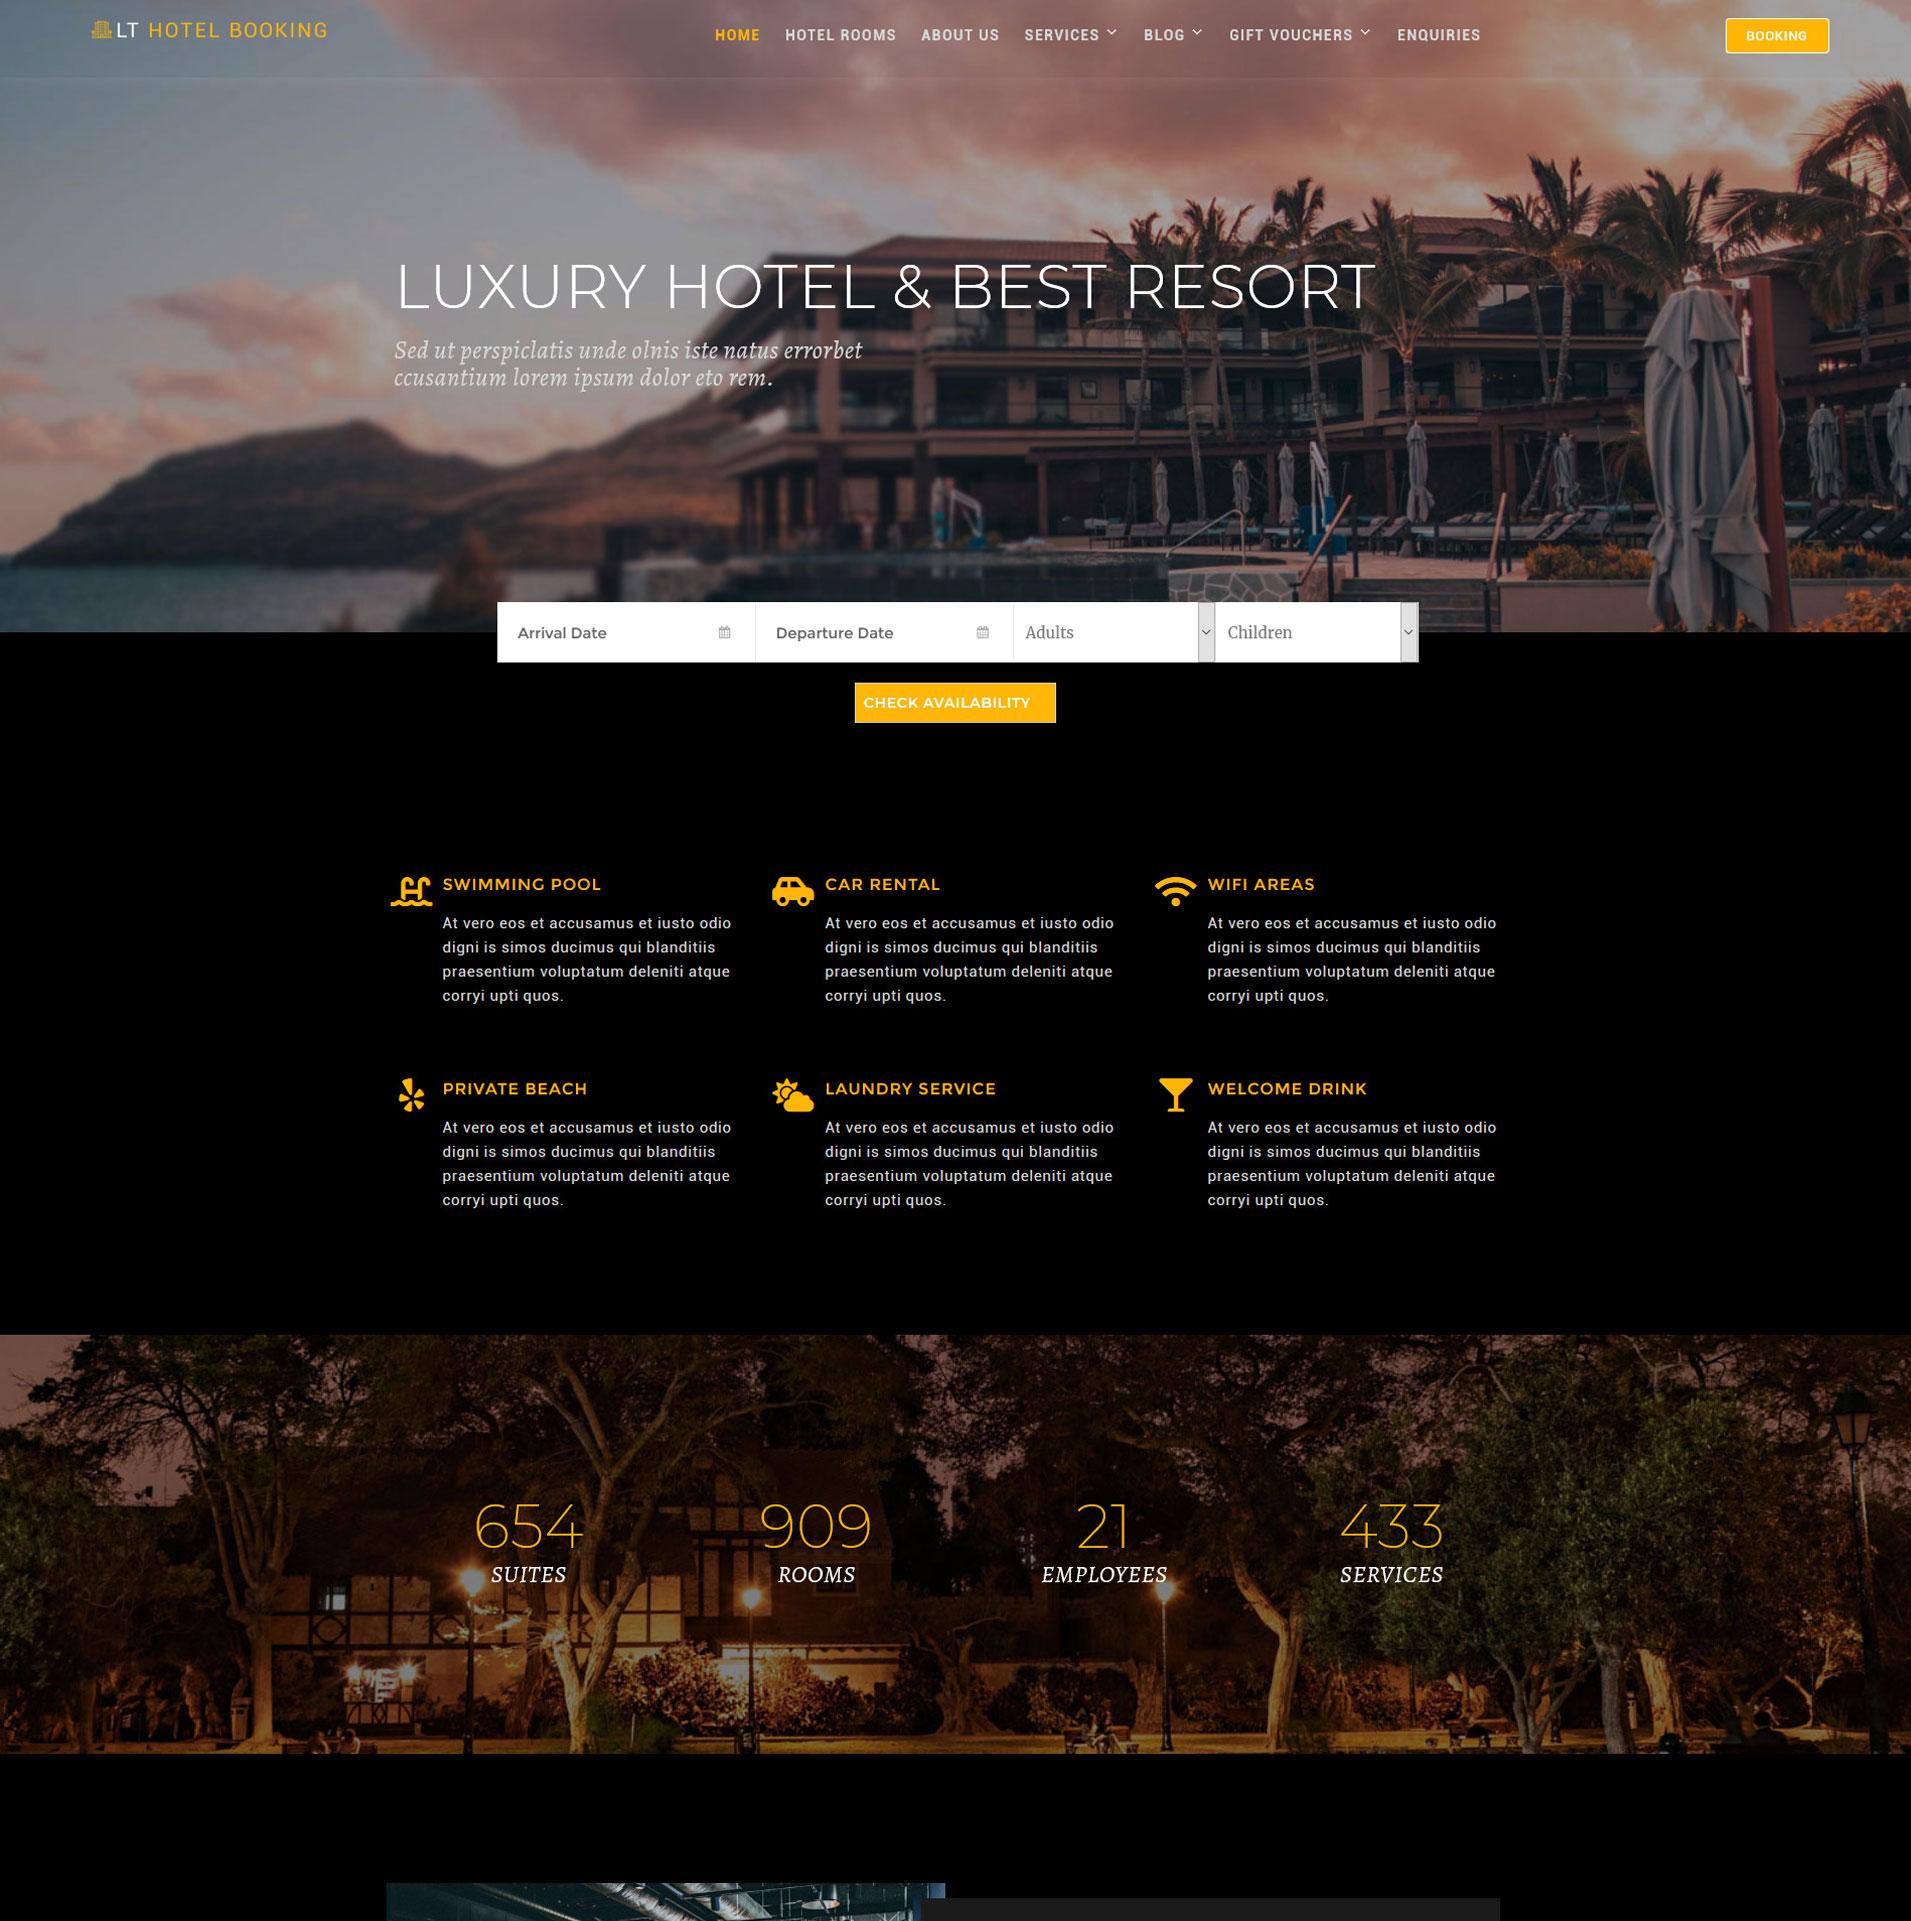 lt-hotel-booking-free-responsive-wordpress-theme